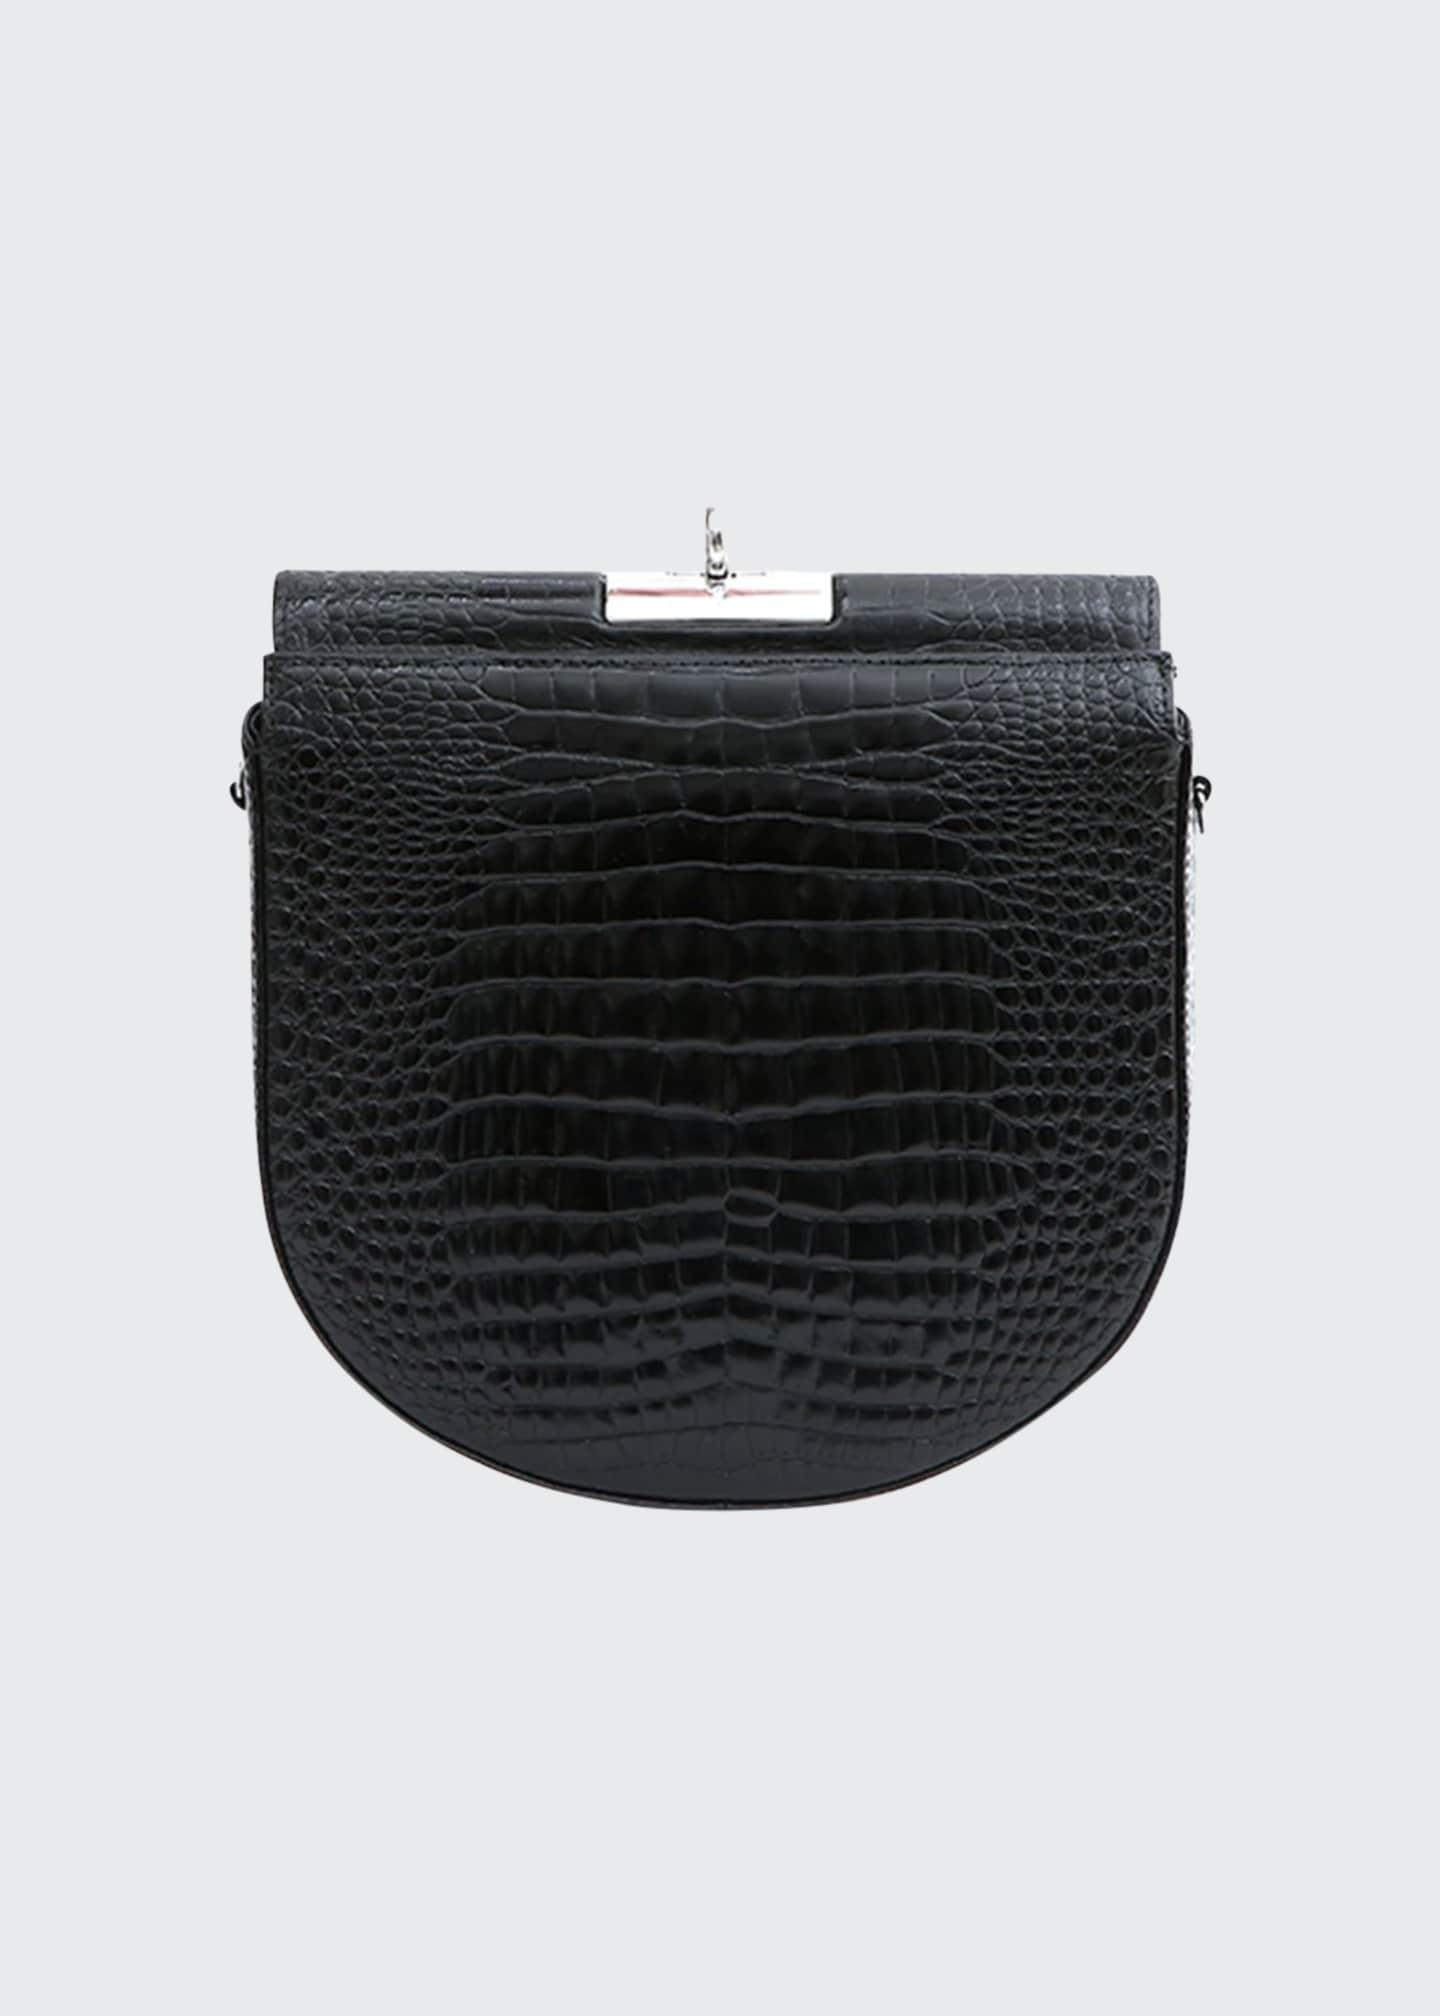 Gu_de Small Demilune Stamped Crocodile Shoulder Bag